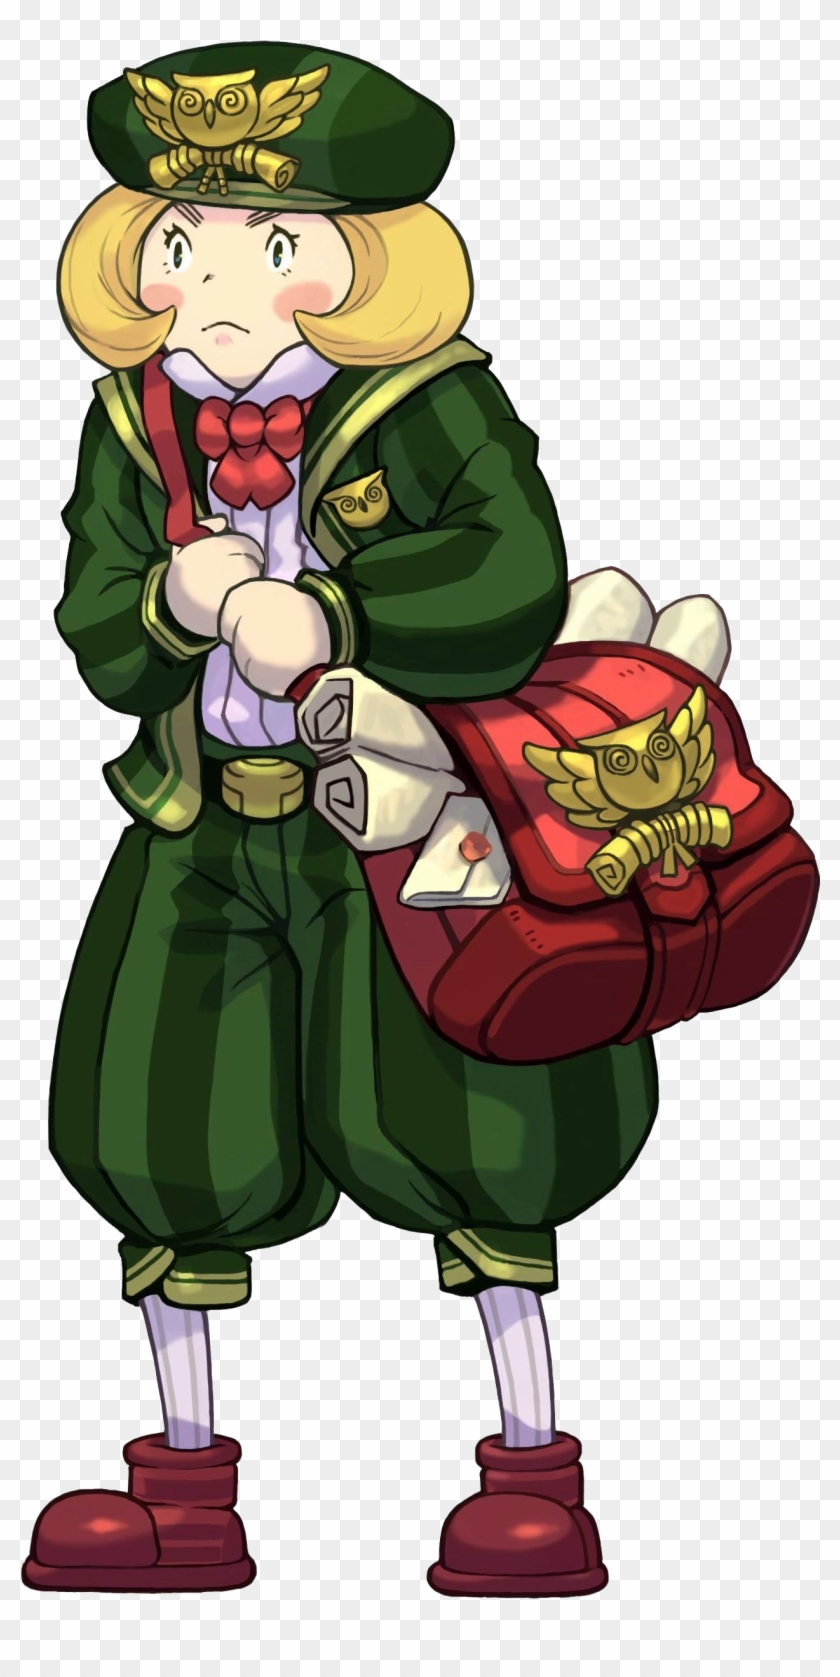 Mailer - Professor Layton Vs Phoenix Wright Characters #1168767